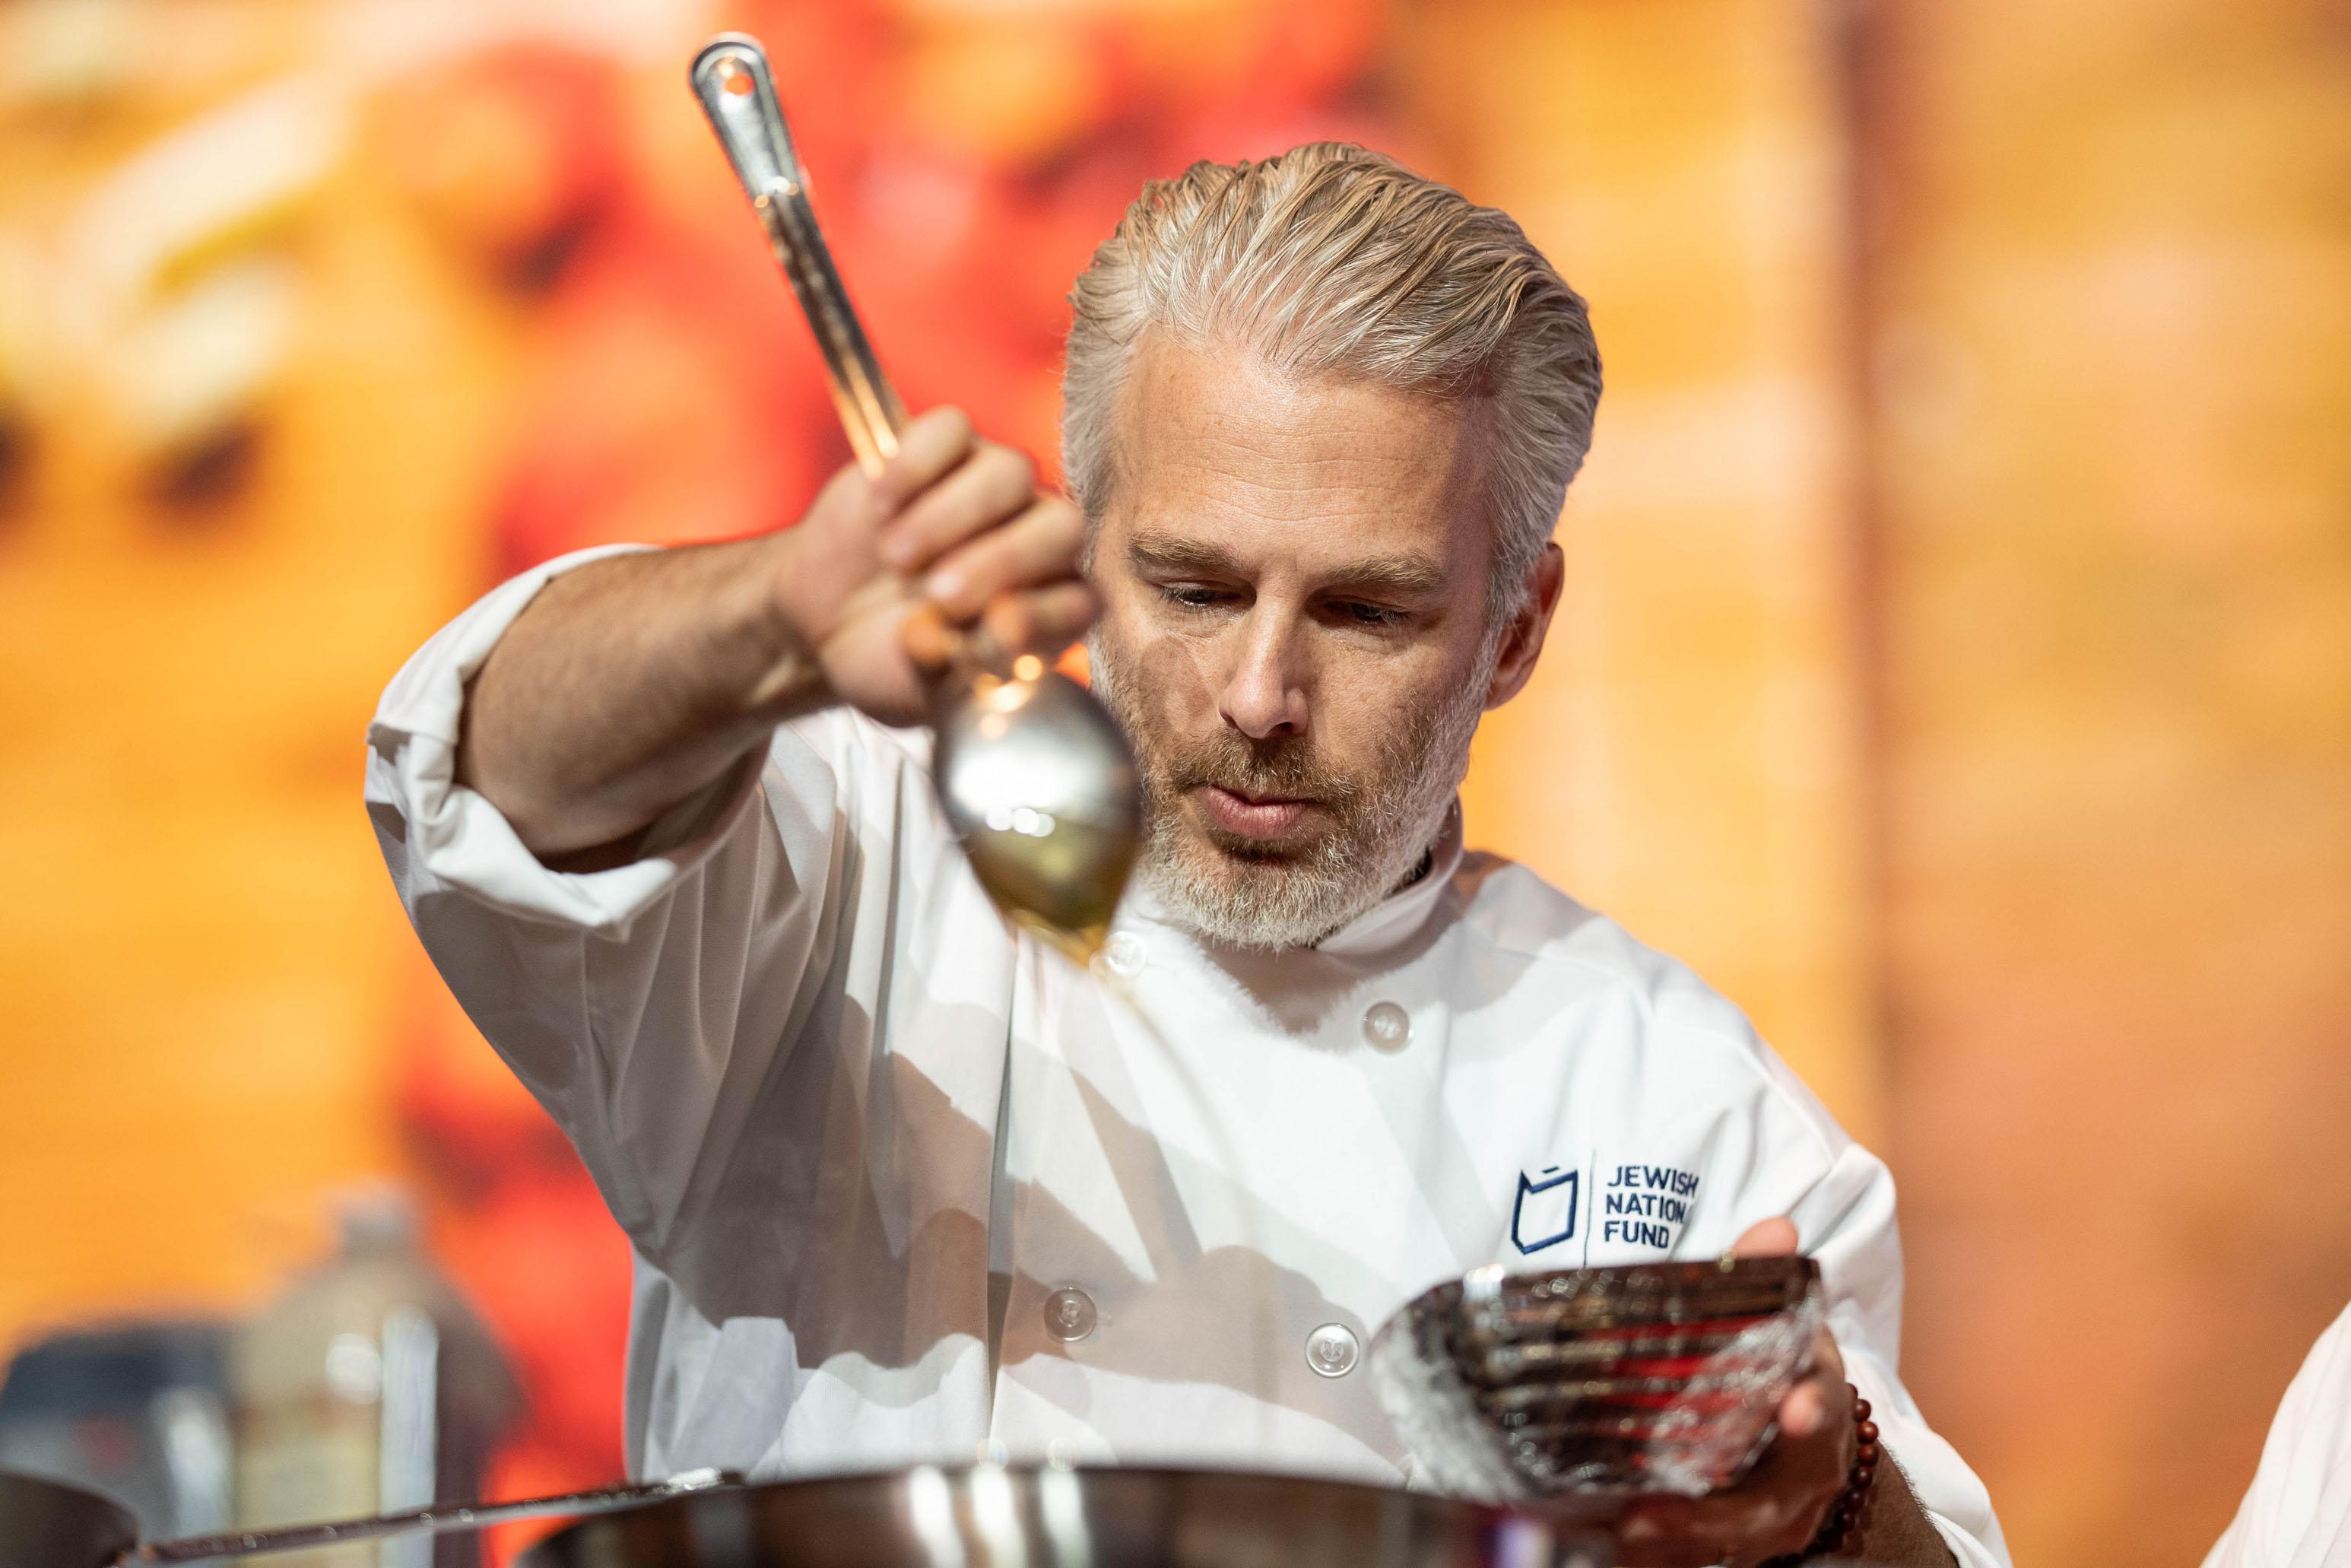 Landing Page_LA Culinary Experience 750x500